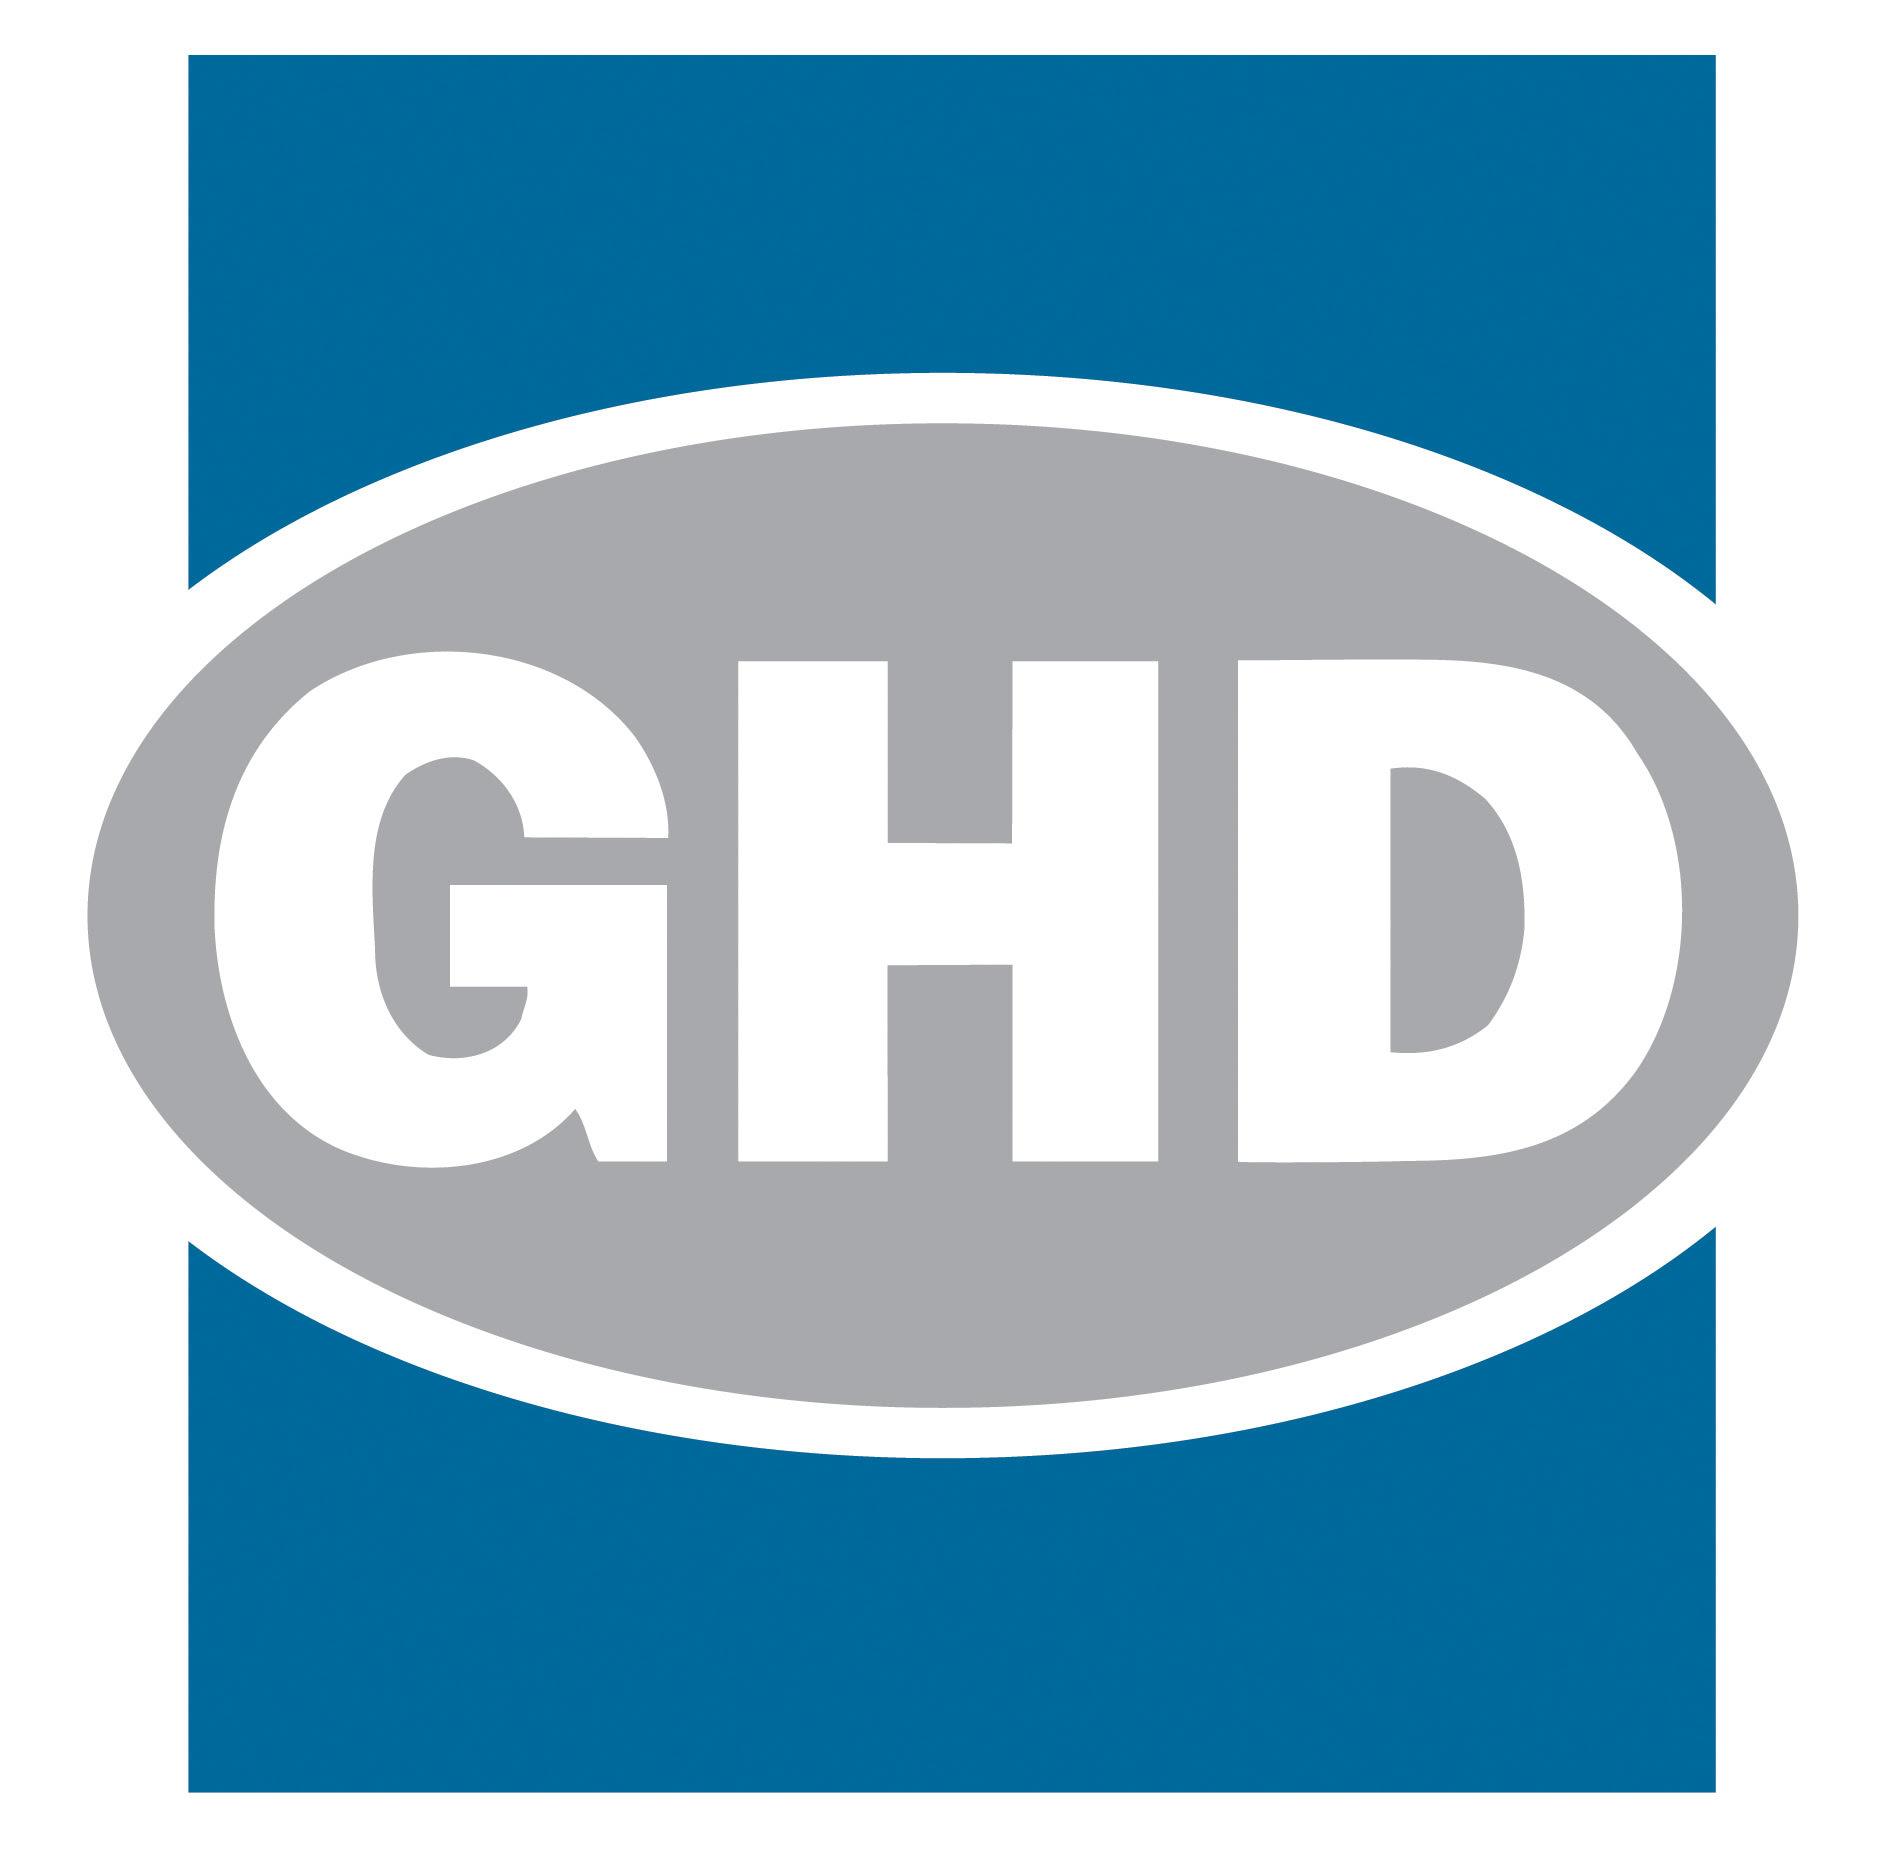 Benefactor - GHD - Logo